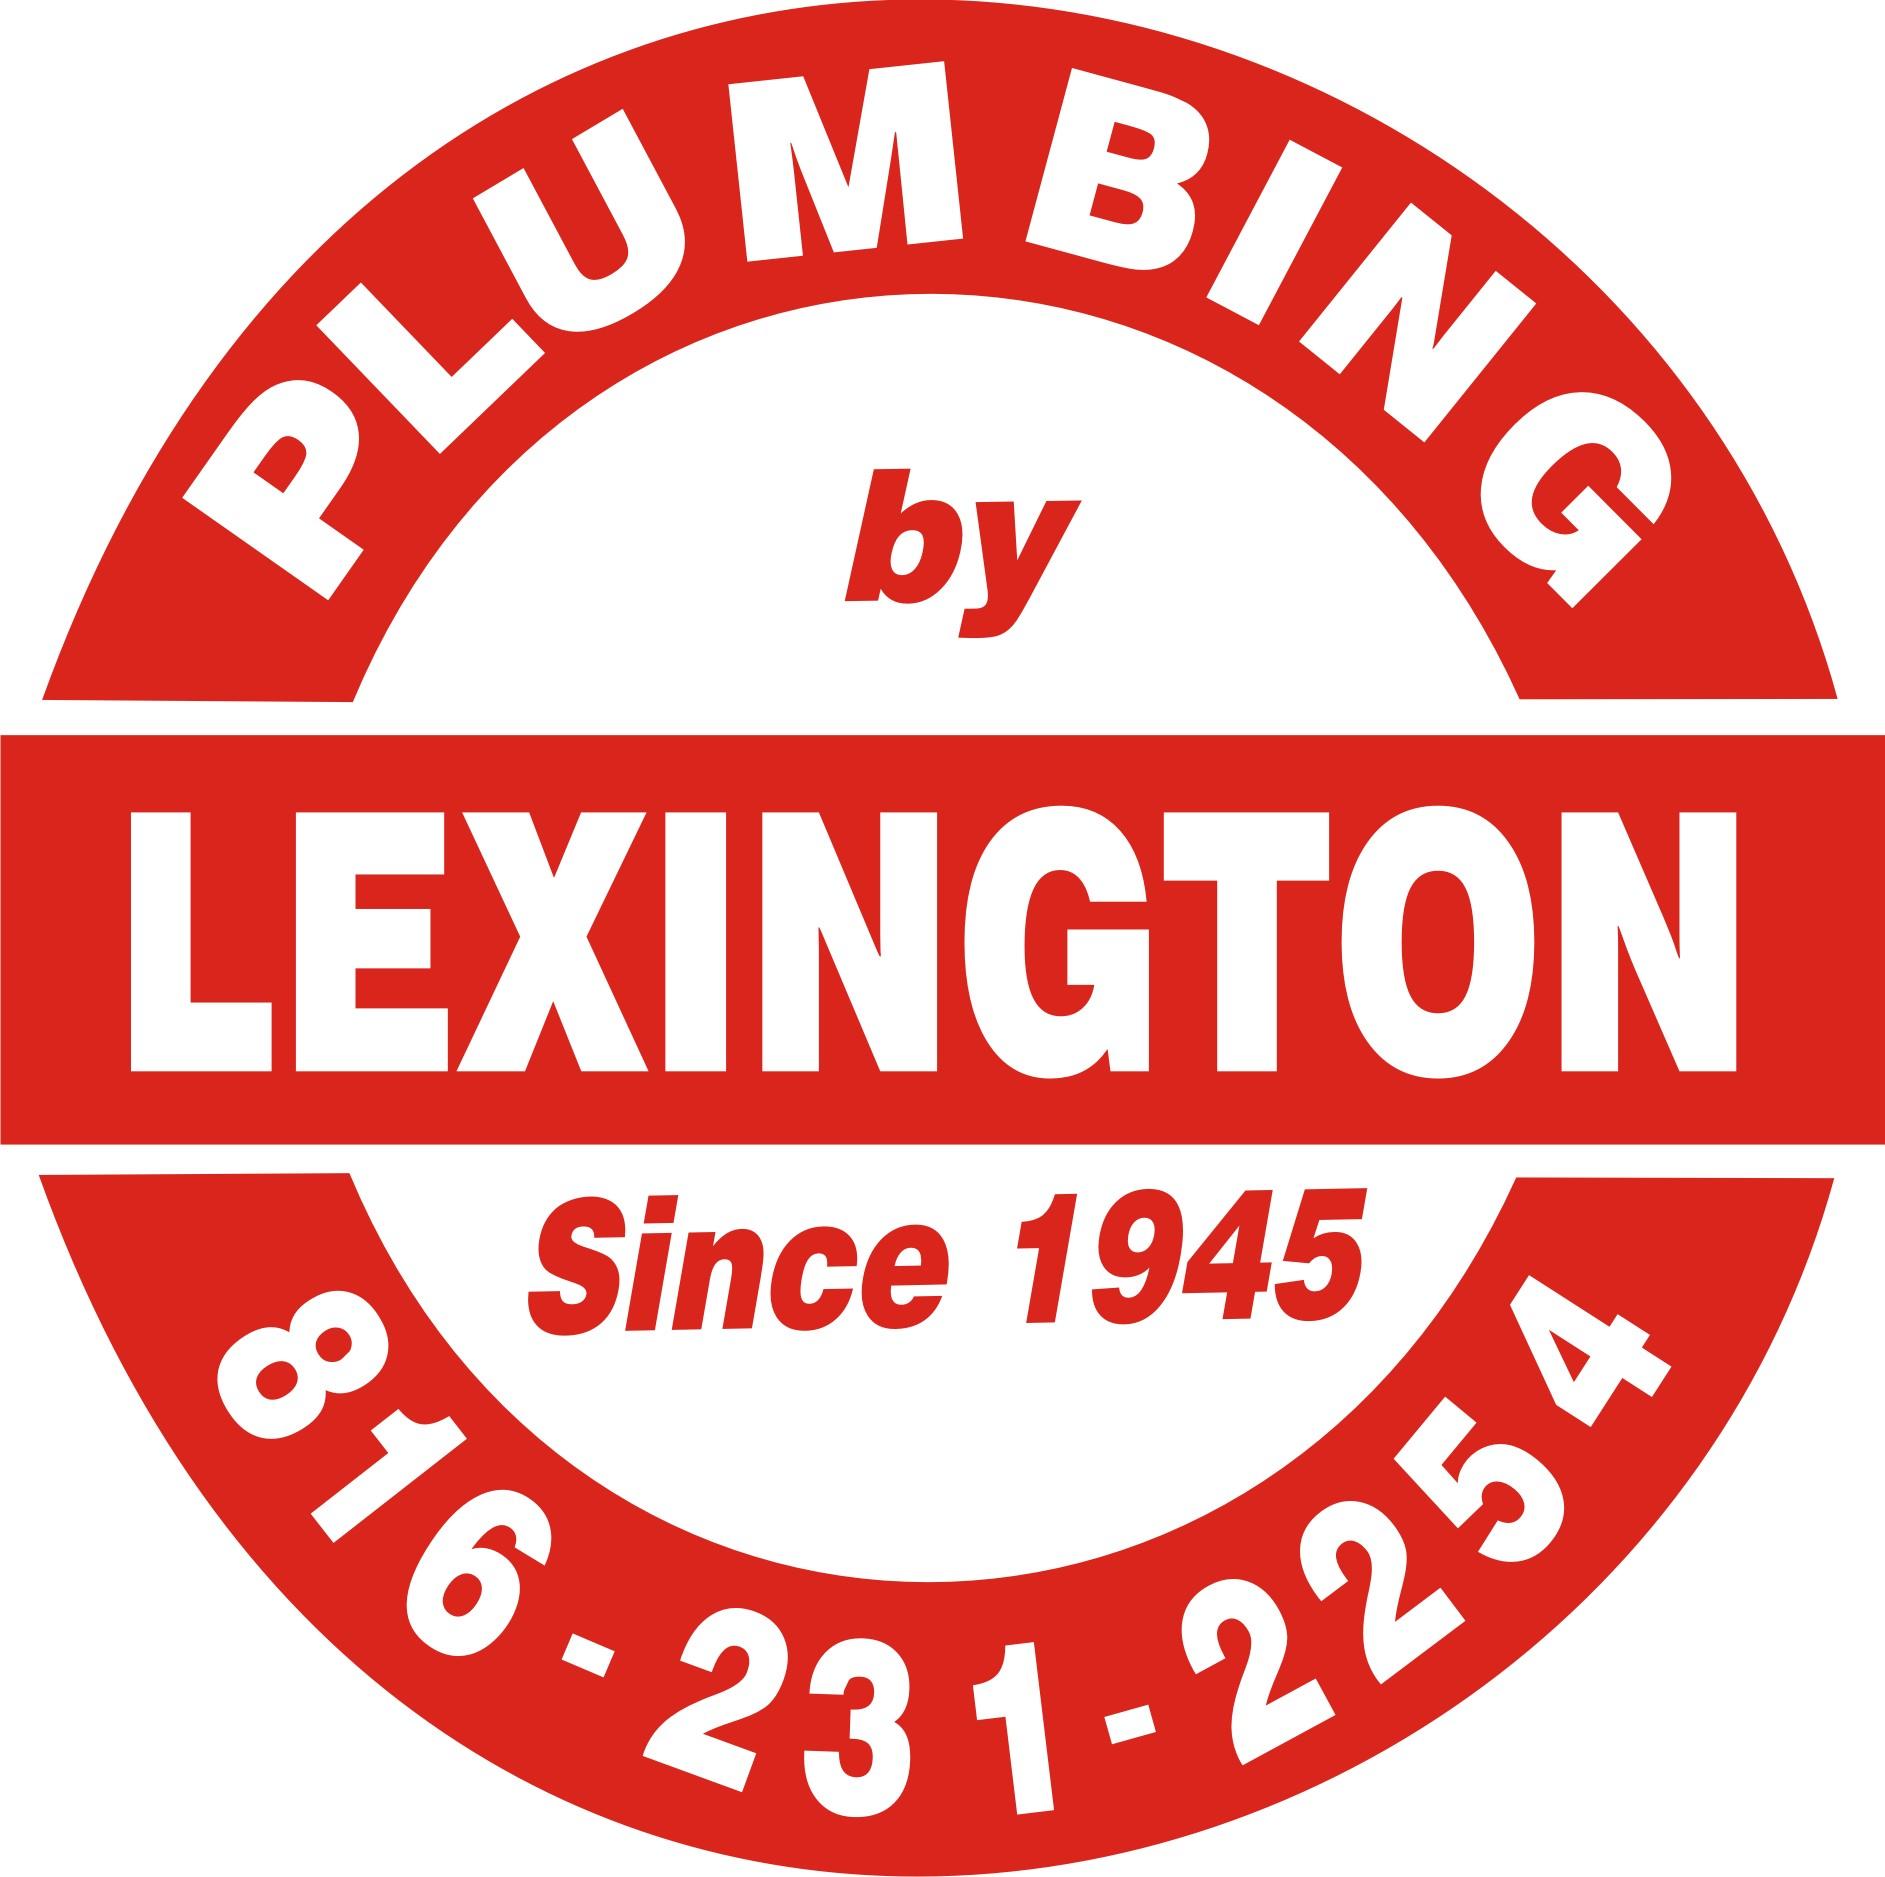 Water Stop Sponsor Lexington Plumbing and Heating Company, Inc.